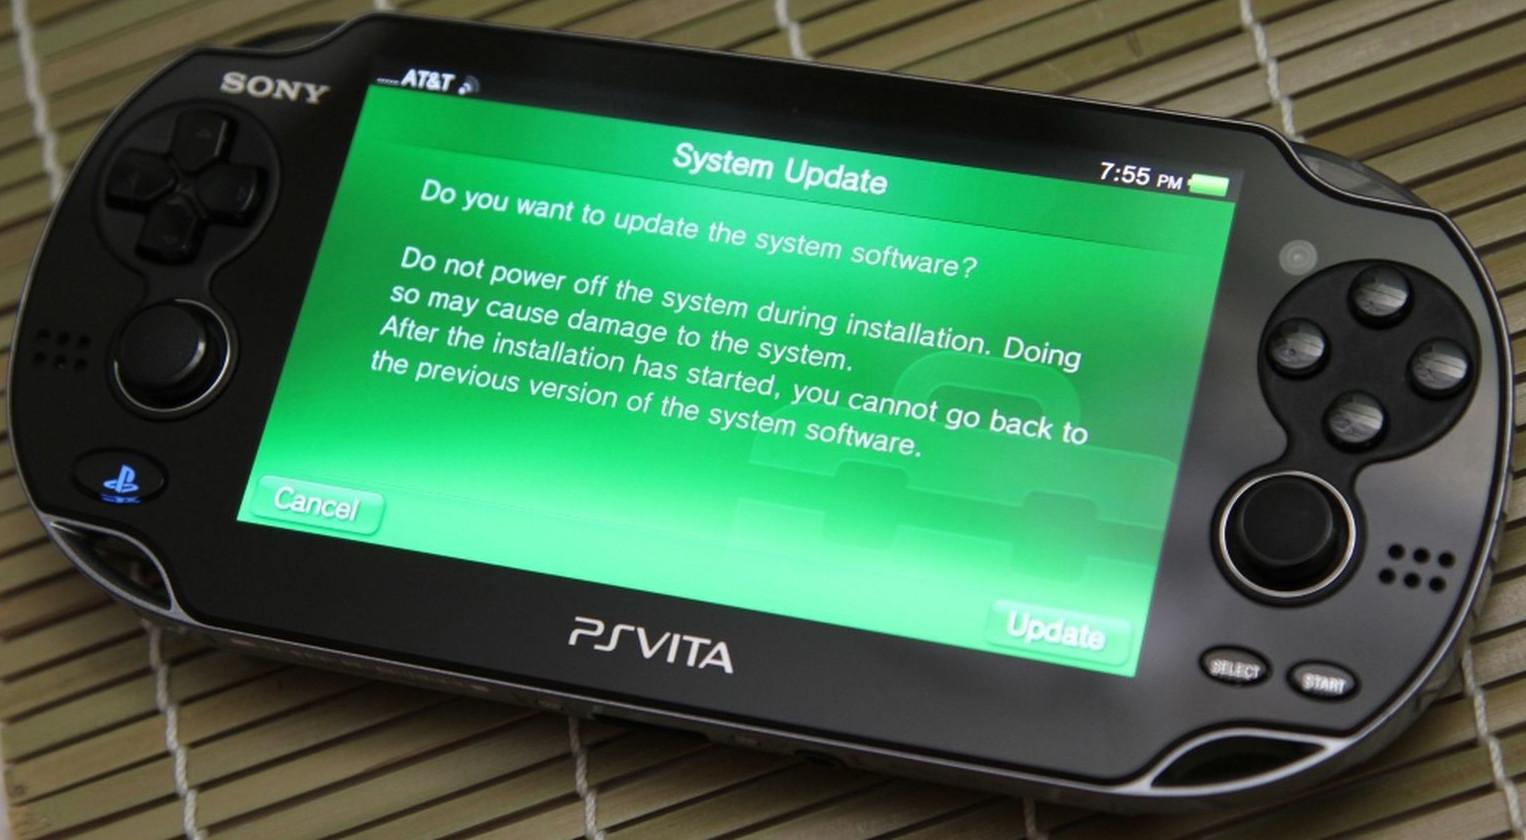 Sony PlayStation Vita Firmware 3 71 Released, Breaks The